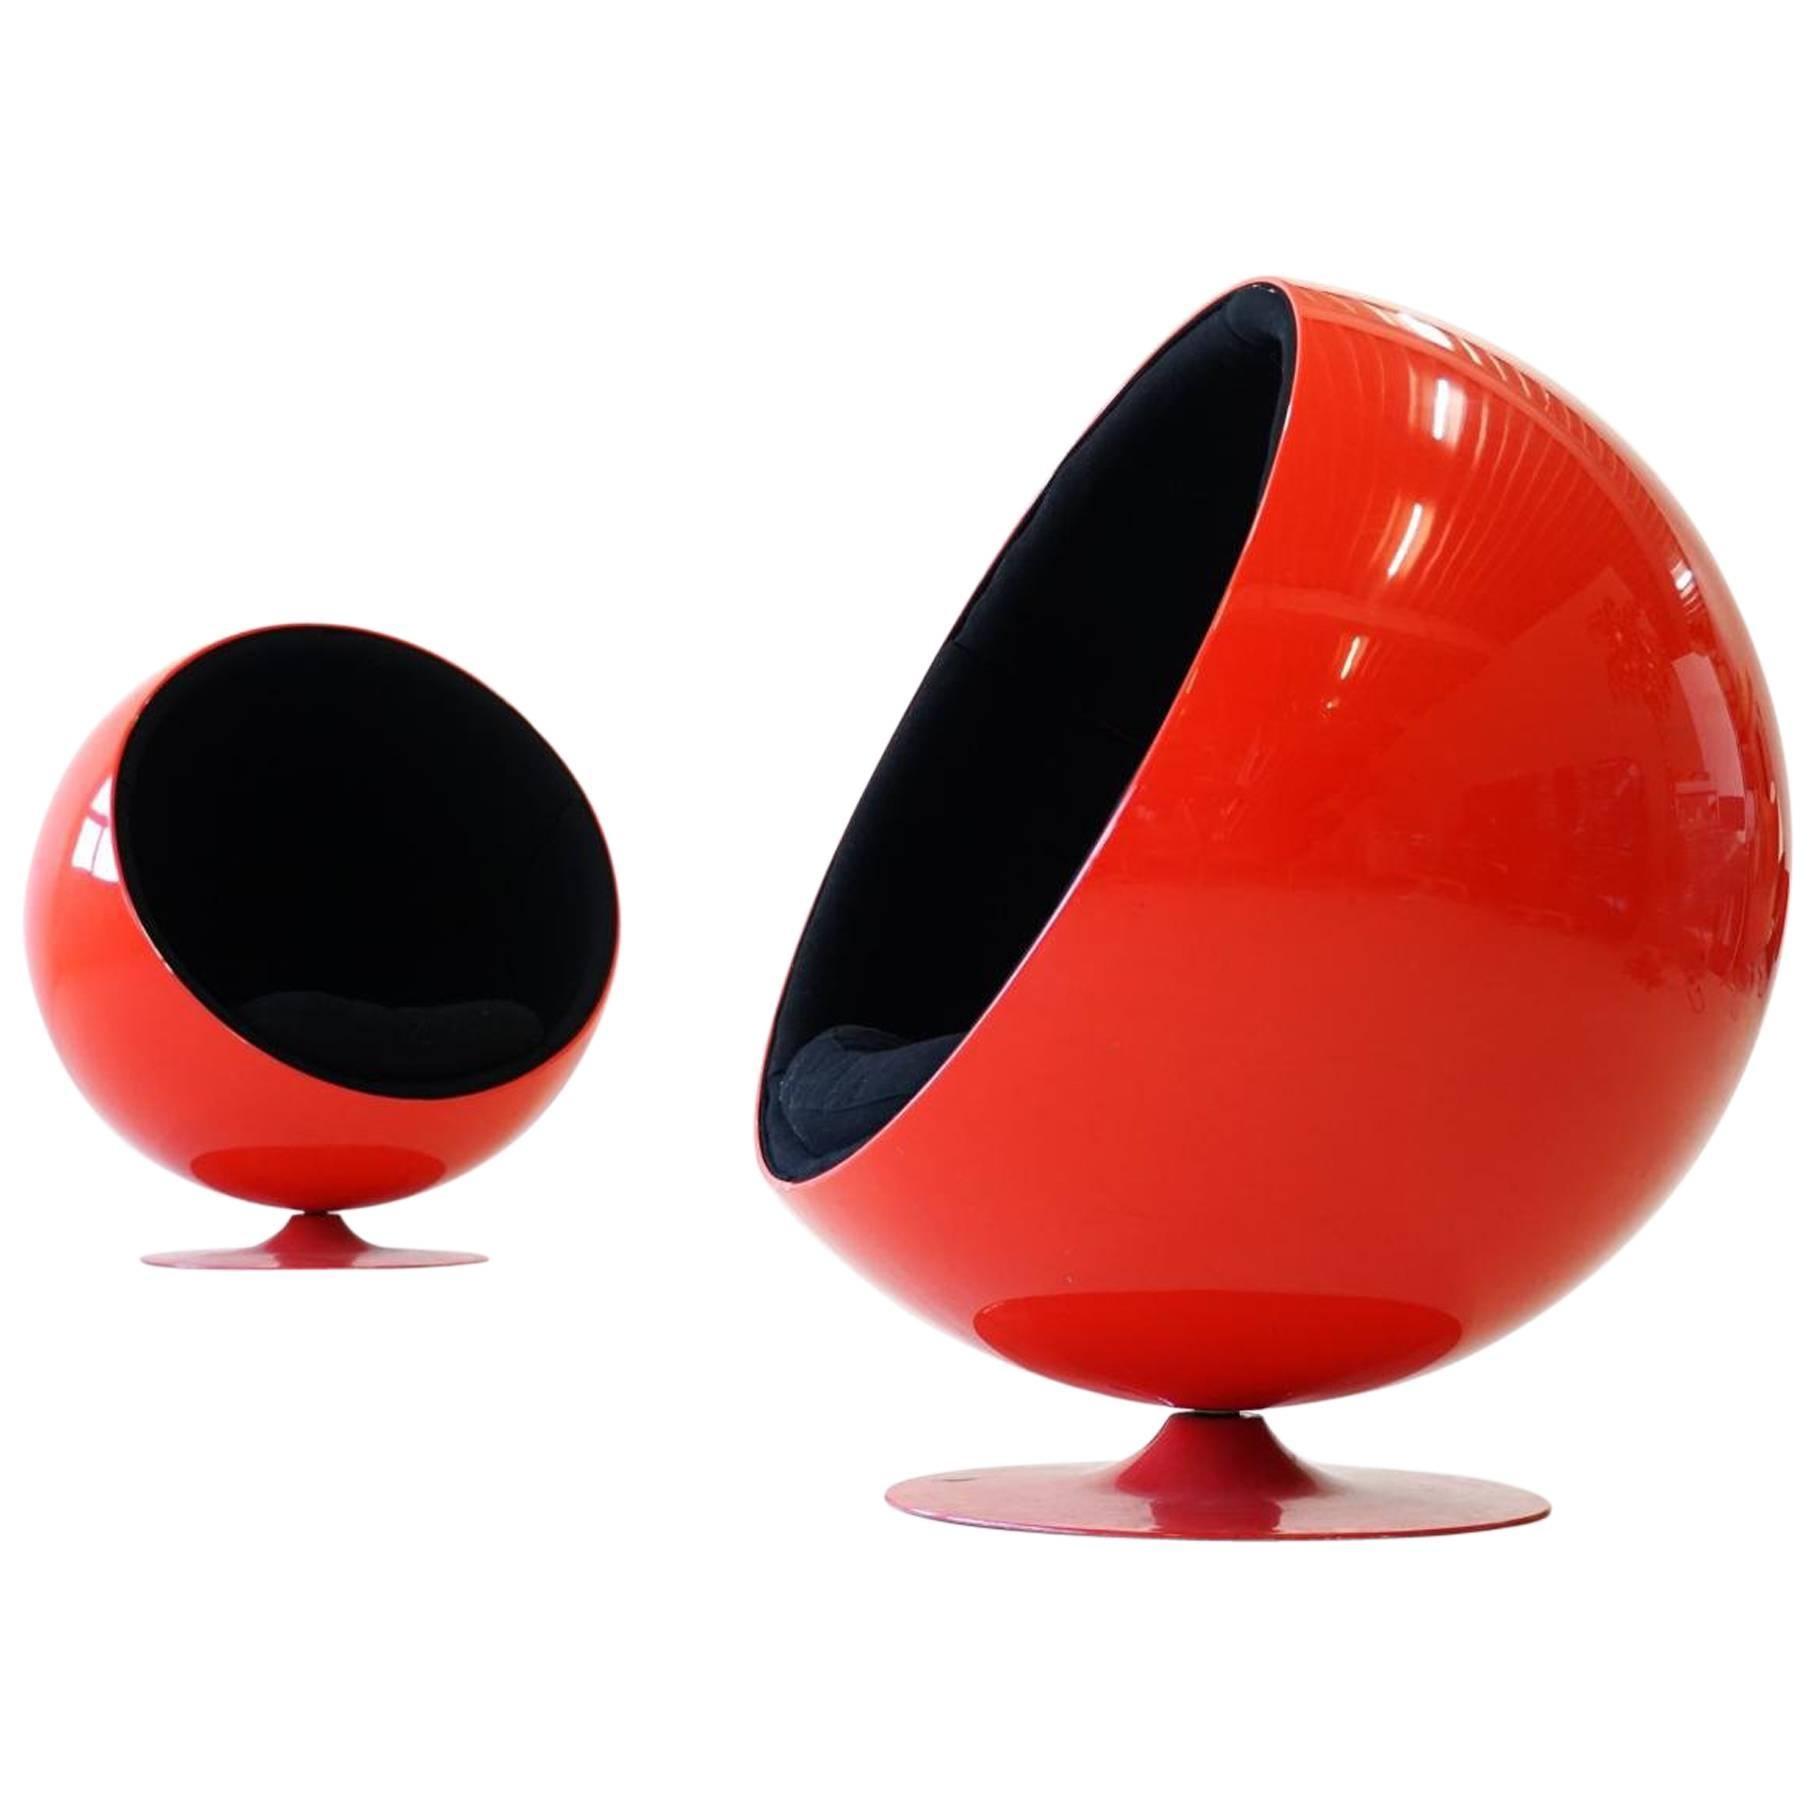 Set Of Two Original Adelta Ball Chair By Eero Aarnio Asko